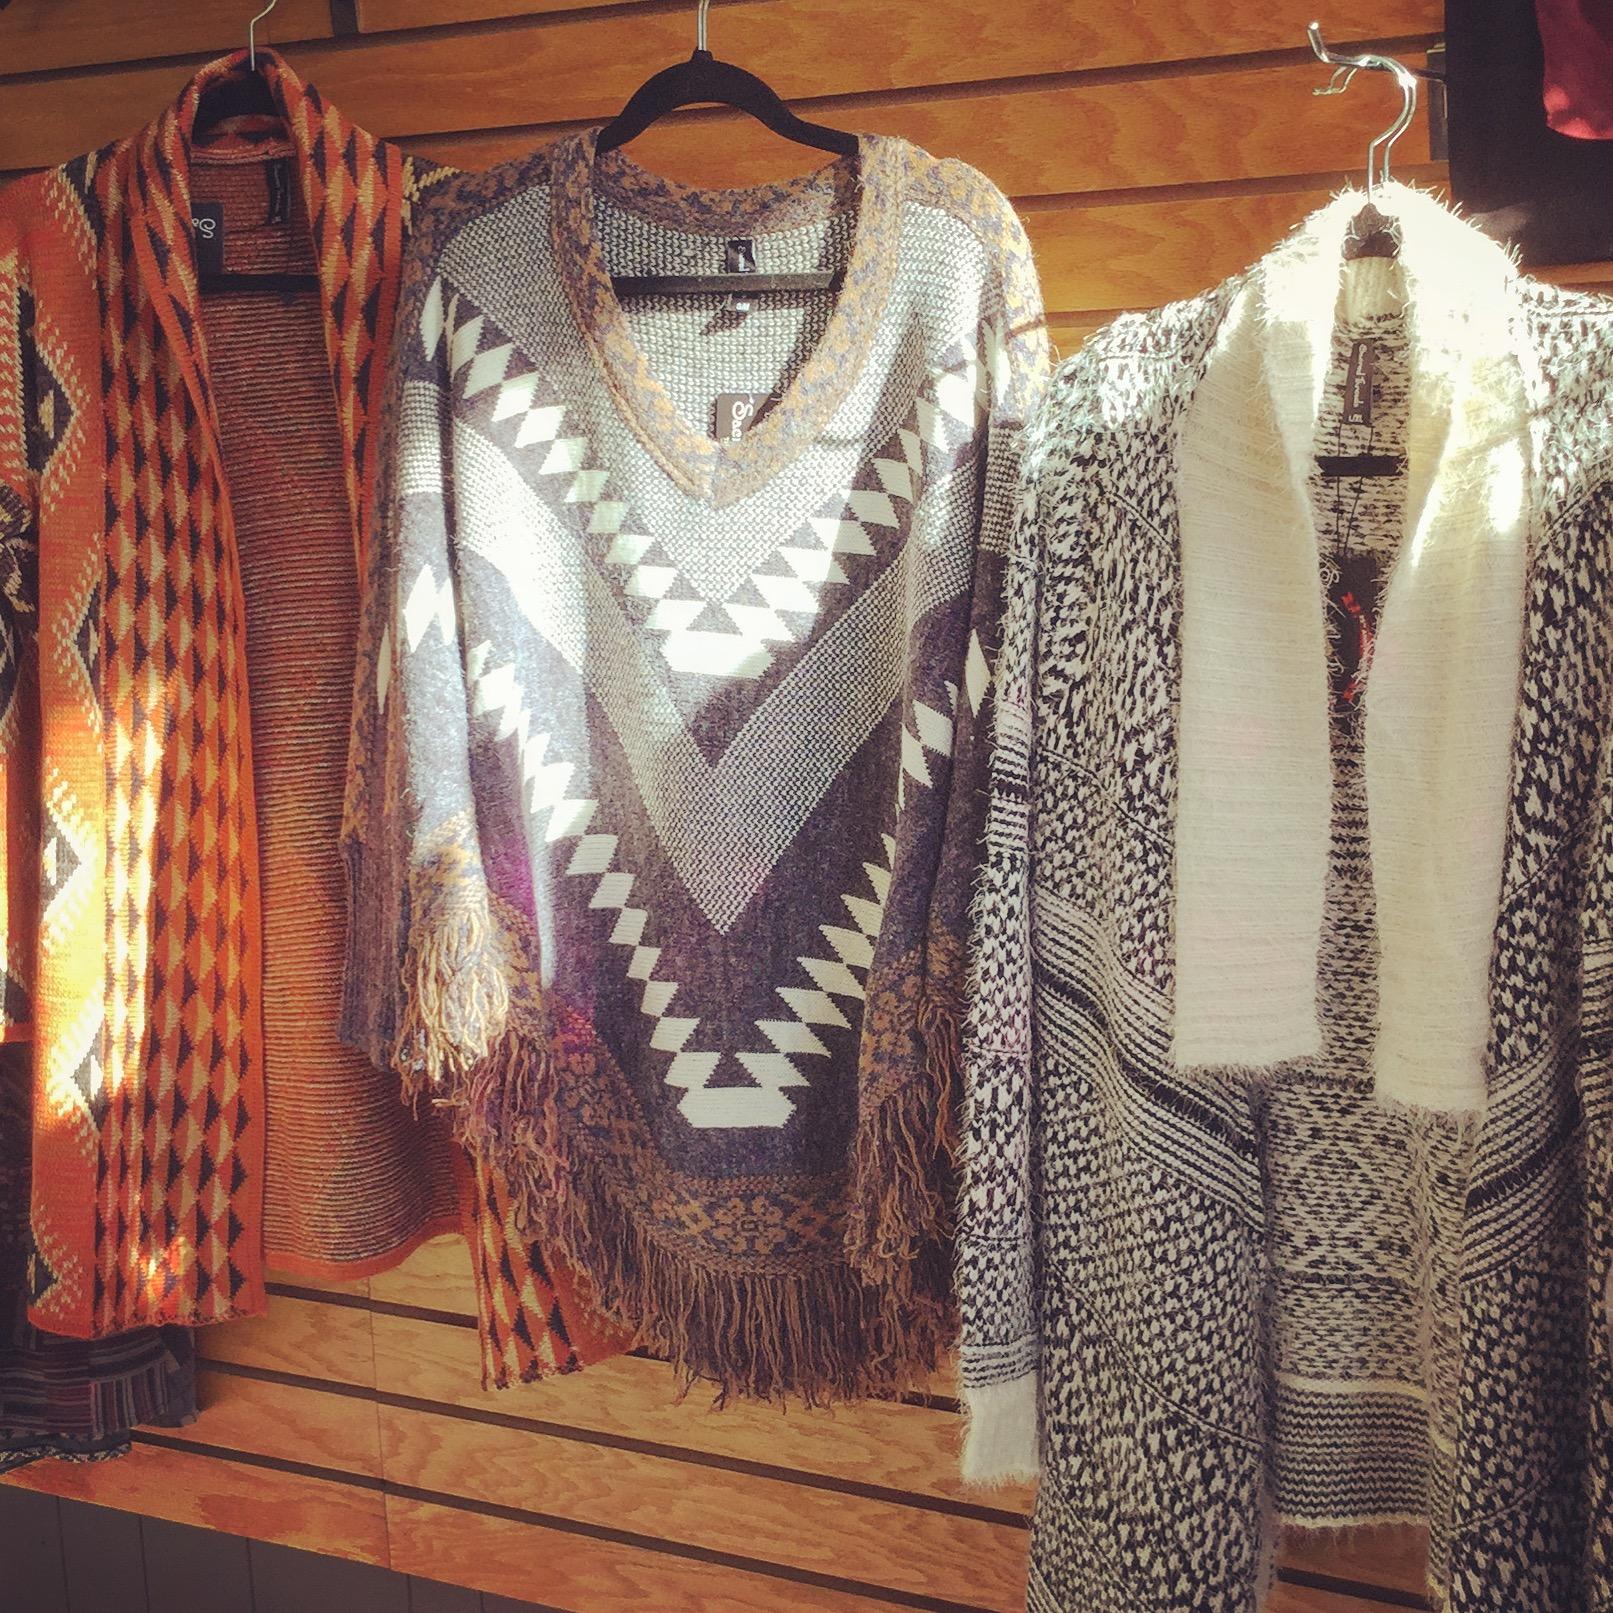 Seaonal Women's Clothing